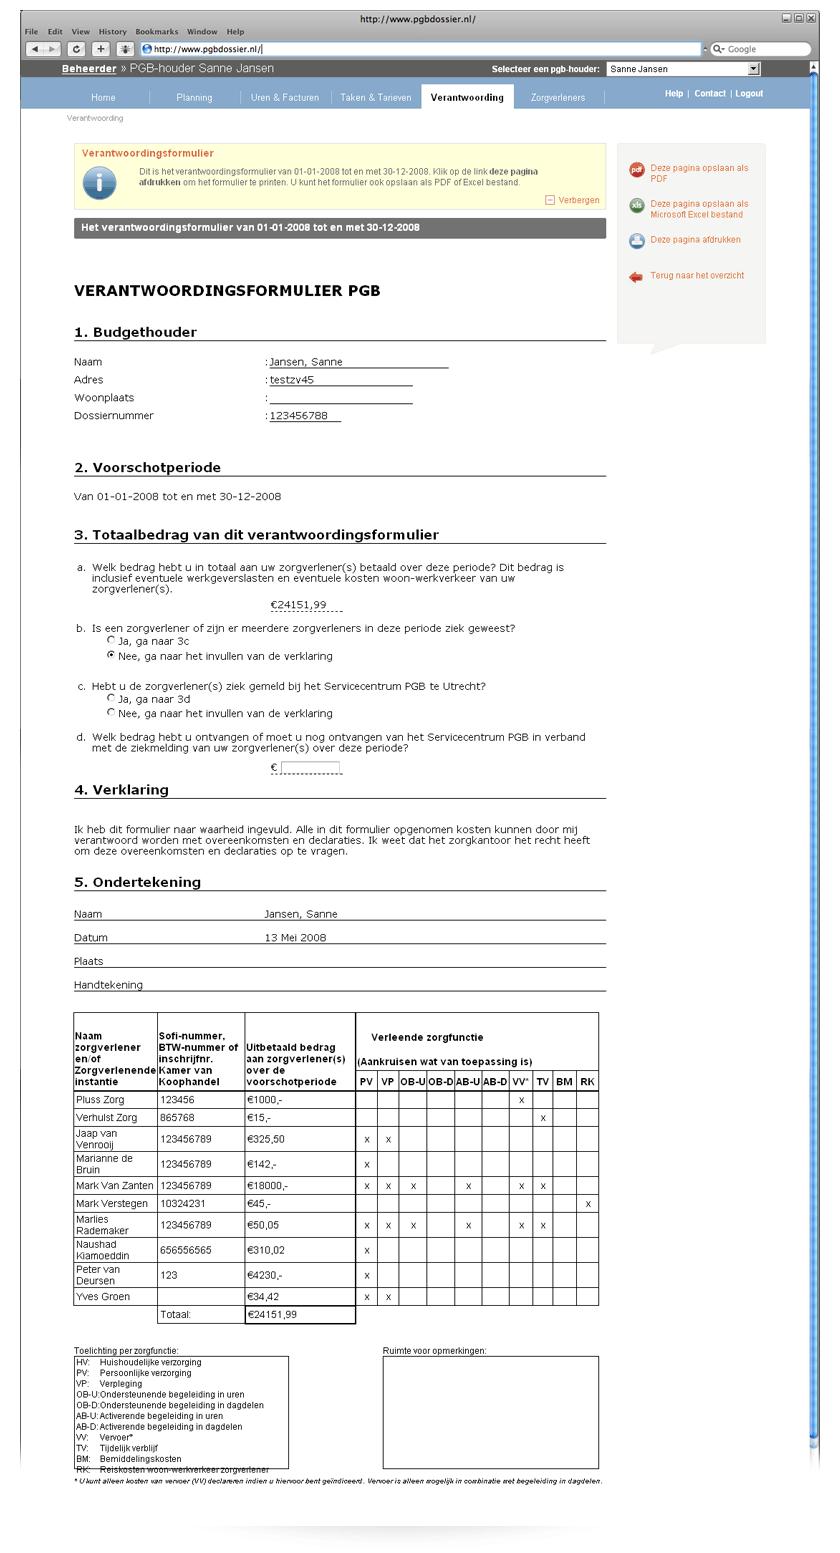 verantwoordingsformulier